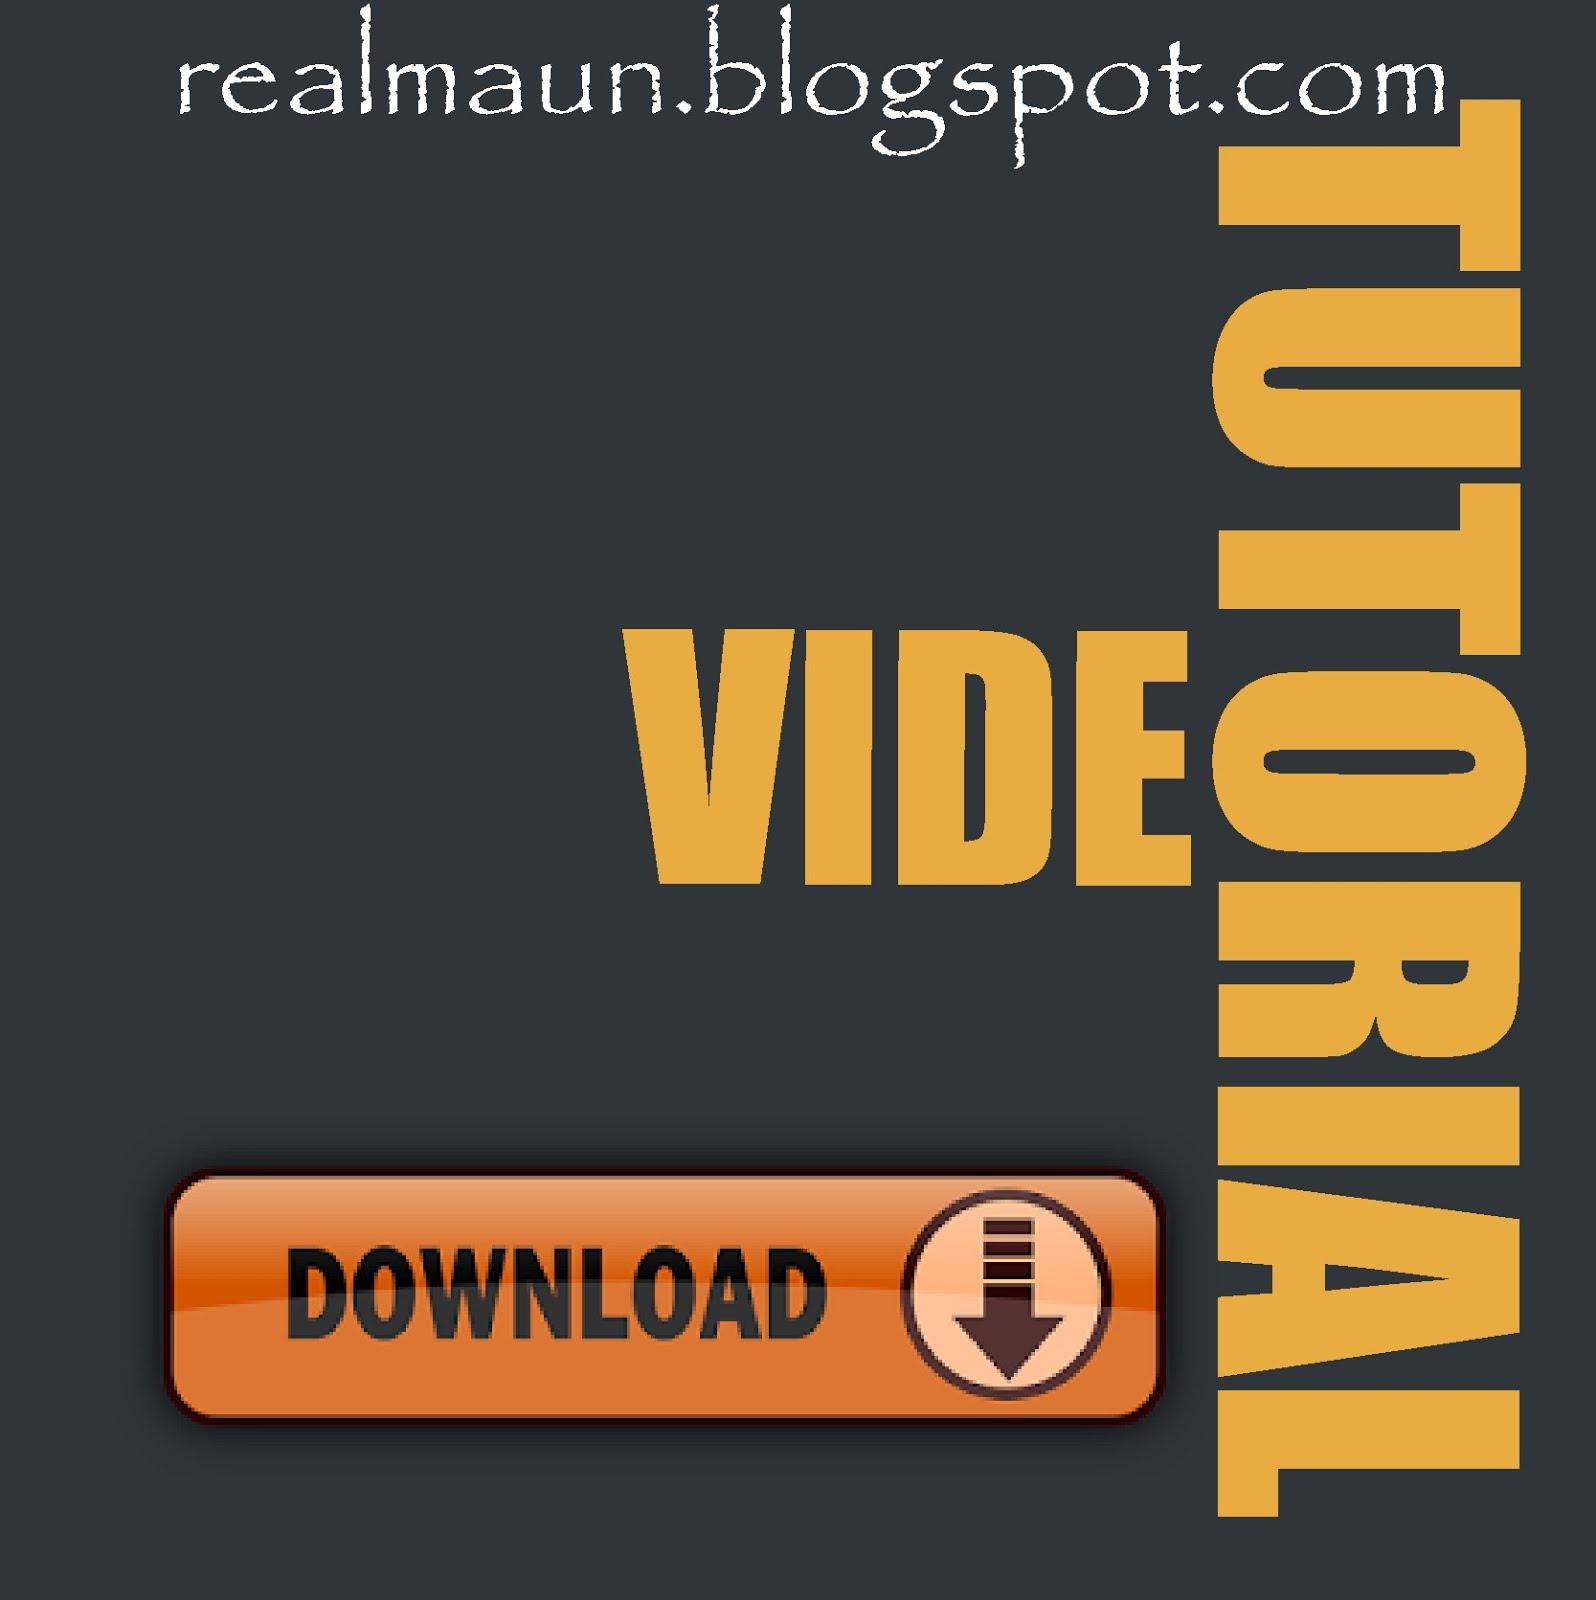 TUTORIAL DOWNLOAD (VIDEO)